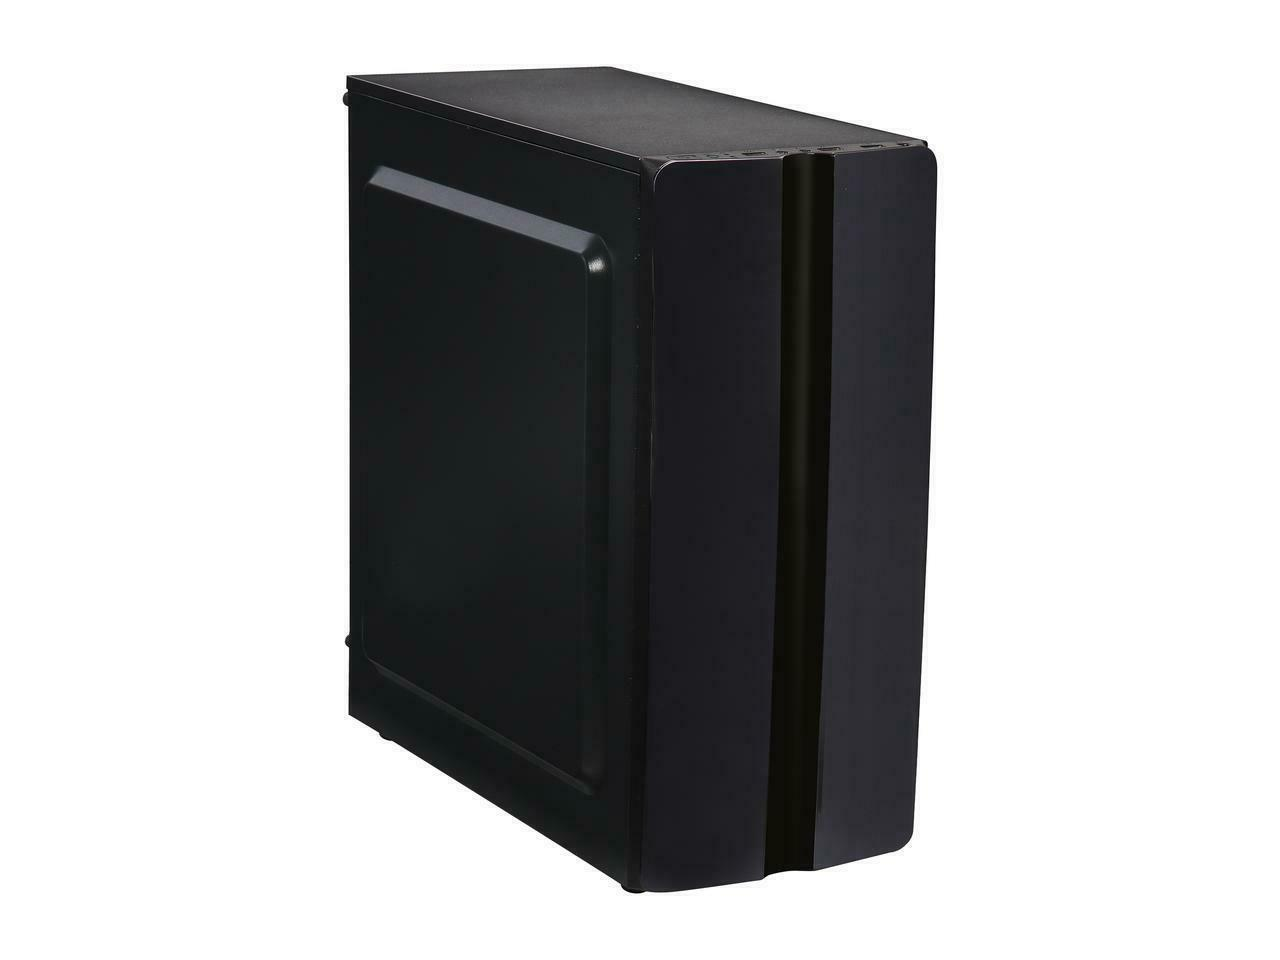 GAMING RYZEN 3.7GHz 8GB RAM VEGA SSD WINDOWS